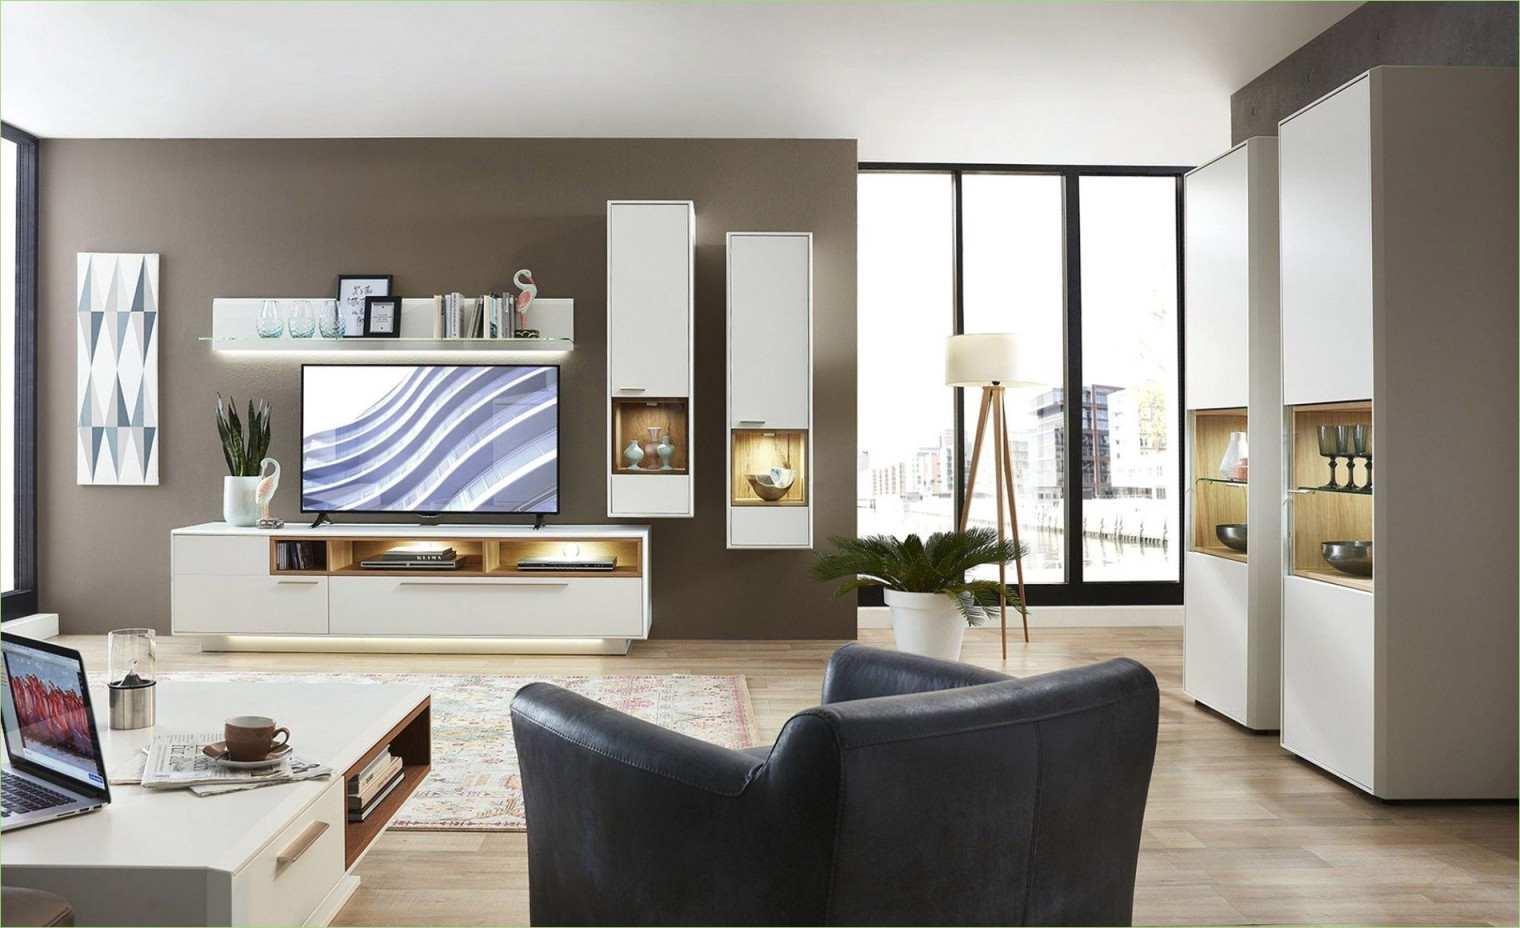 Wohnzimmer Ikea Wohnwand Ideen